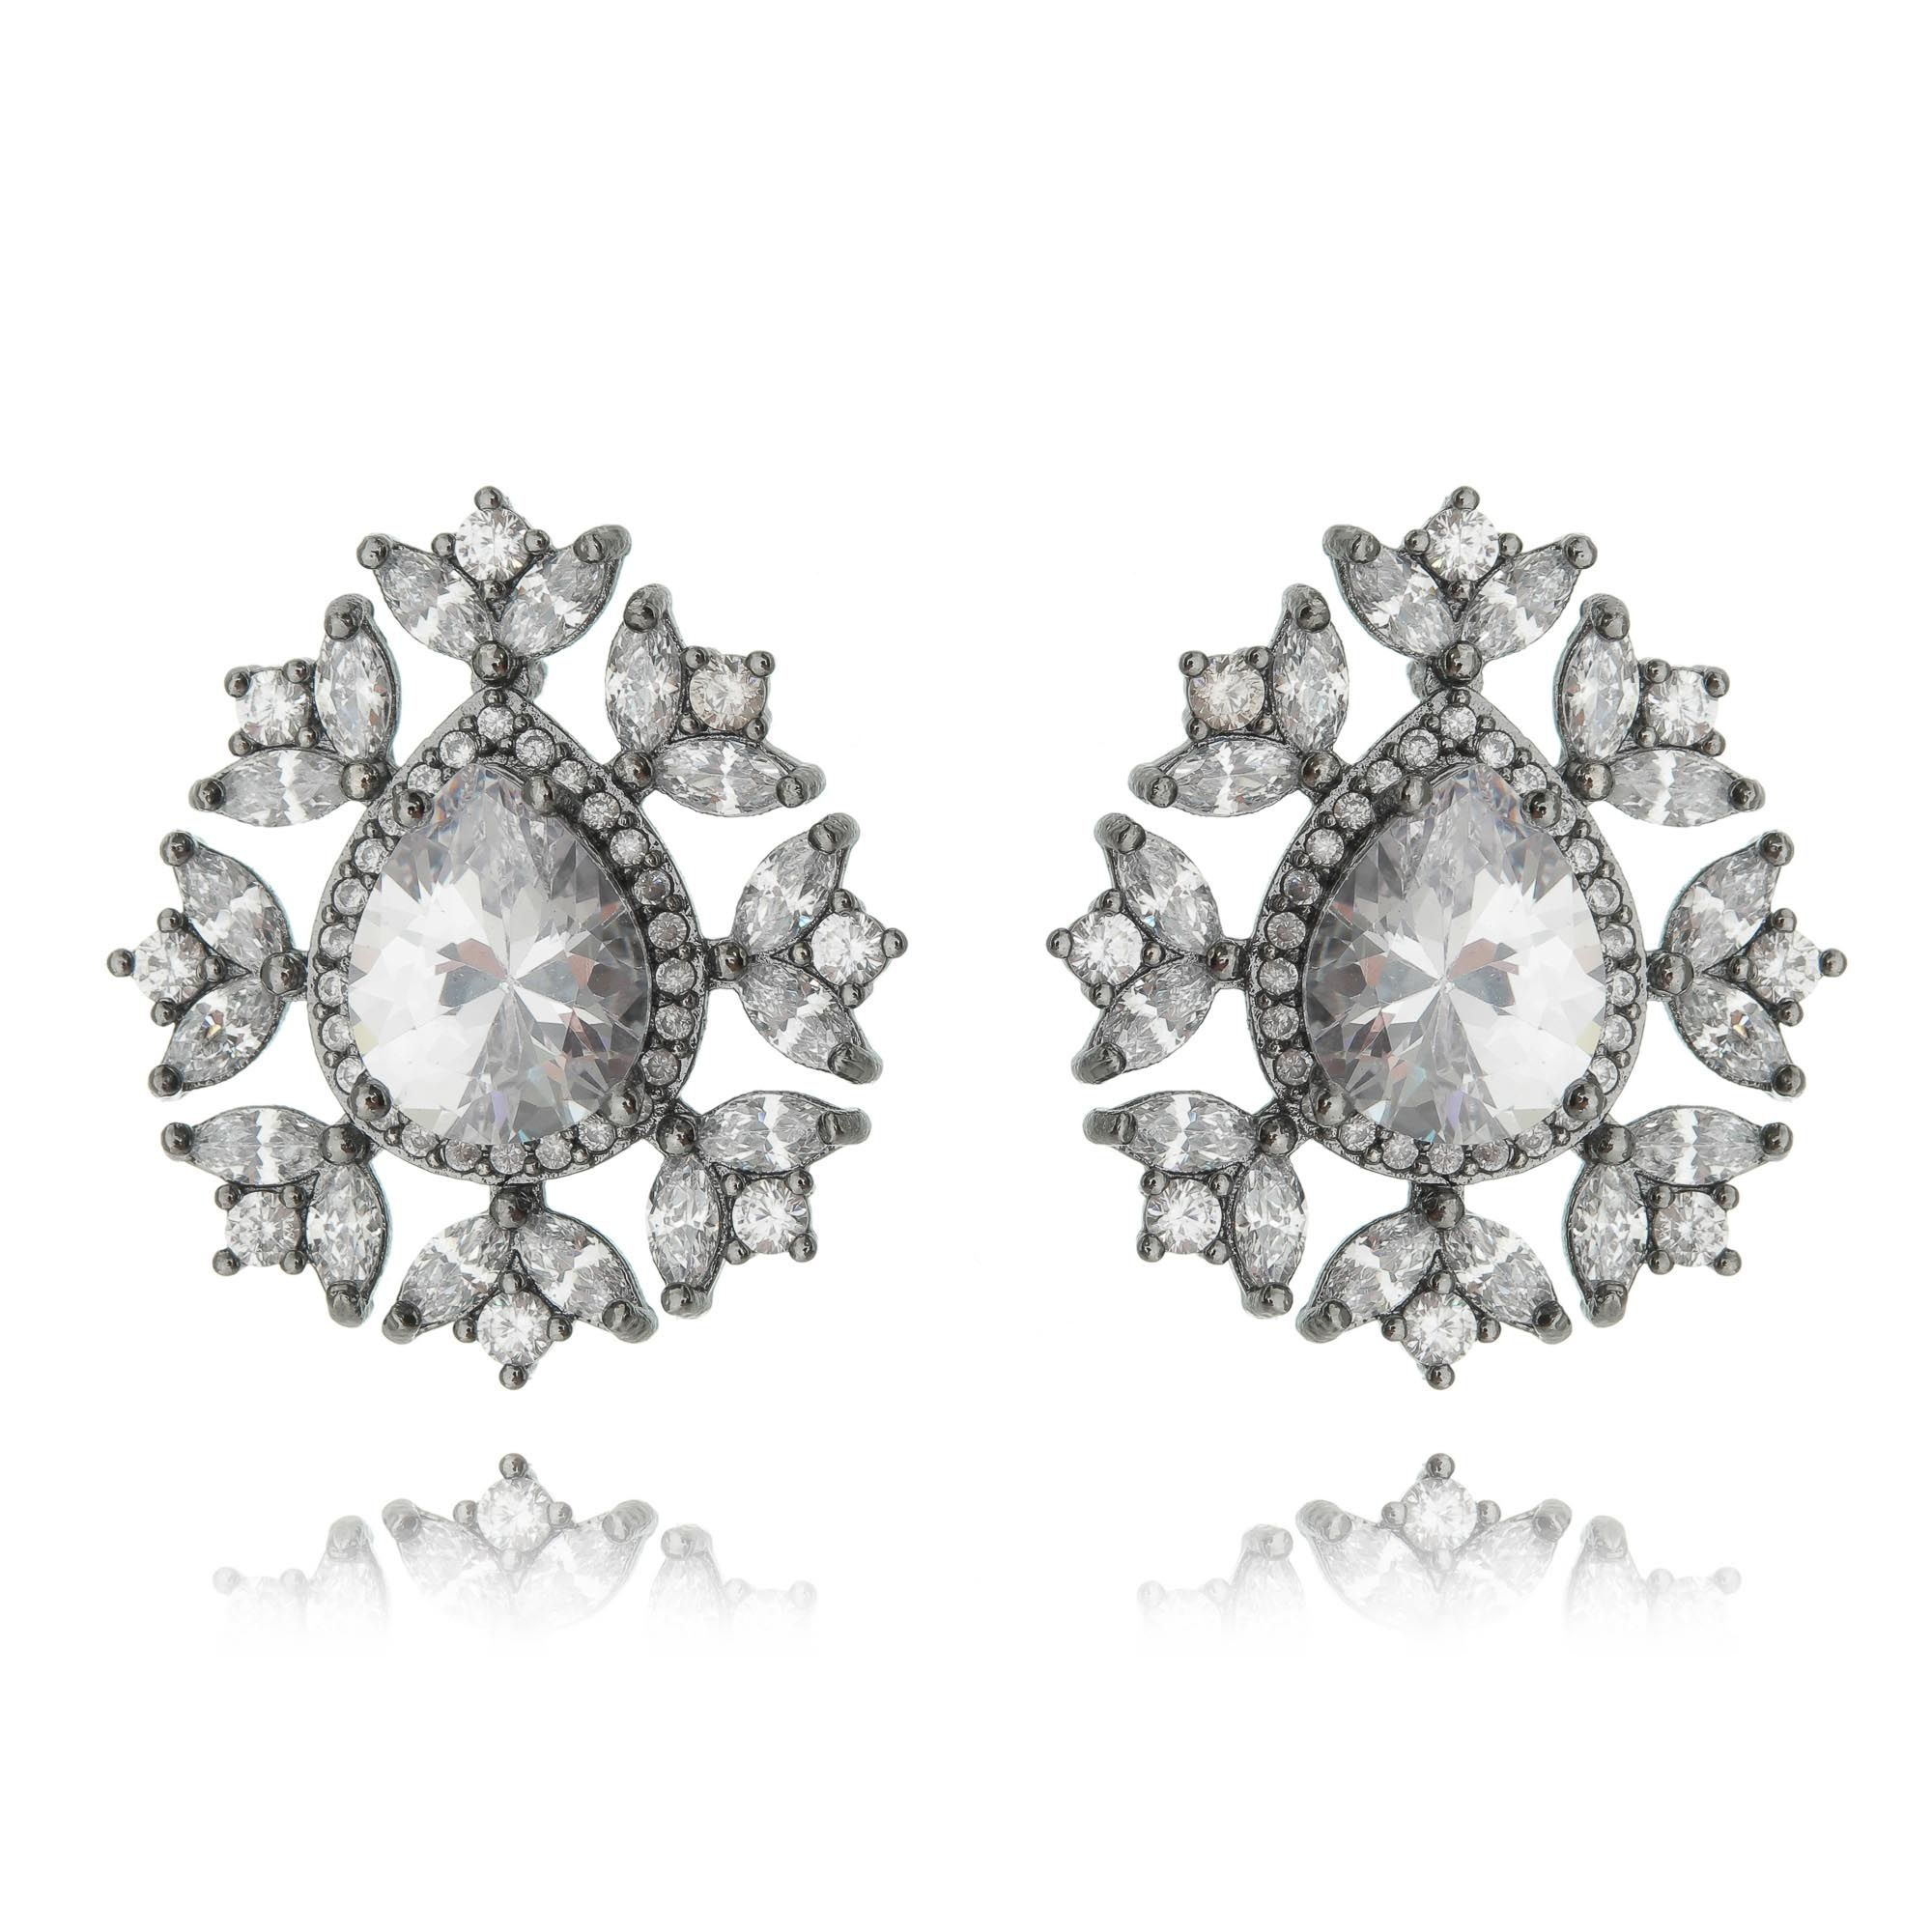 Brinco Luxuoso Cristal Zircônias Semijoia Fina em Ródio Negro  - Soloyou